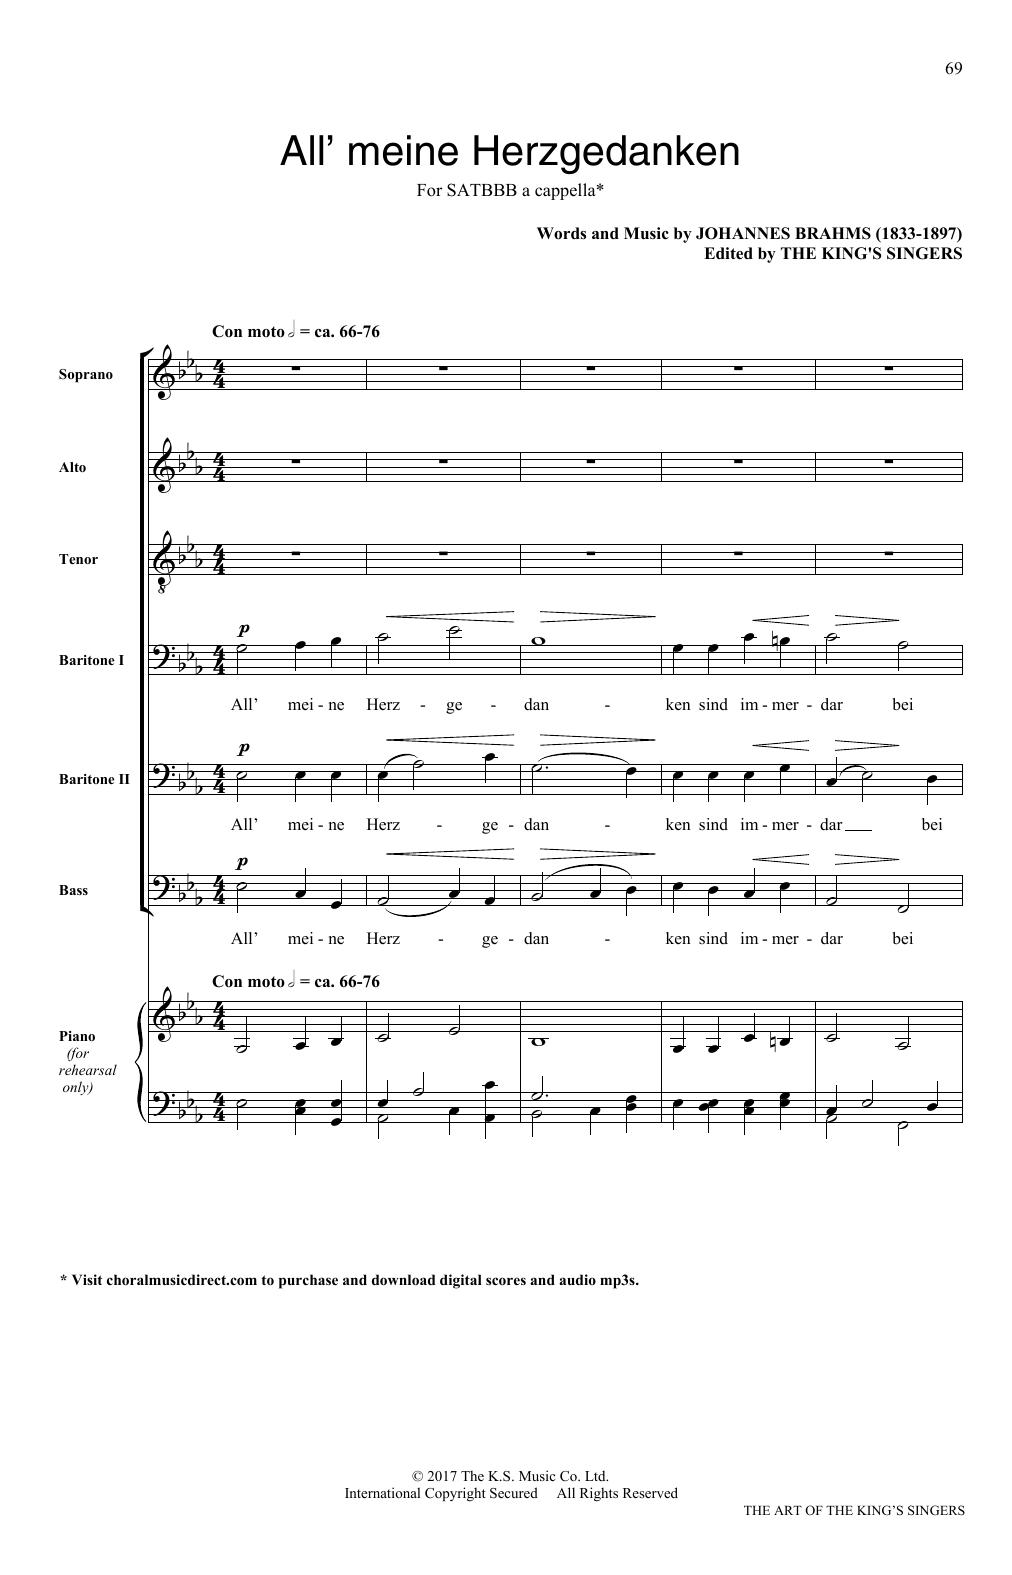 Johannes Brahms Alle meine Herzgedanken sheet music notes and chords. Download Printable PDF.